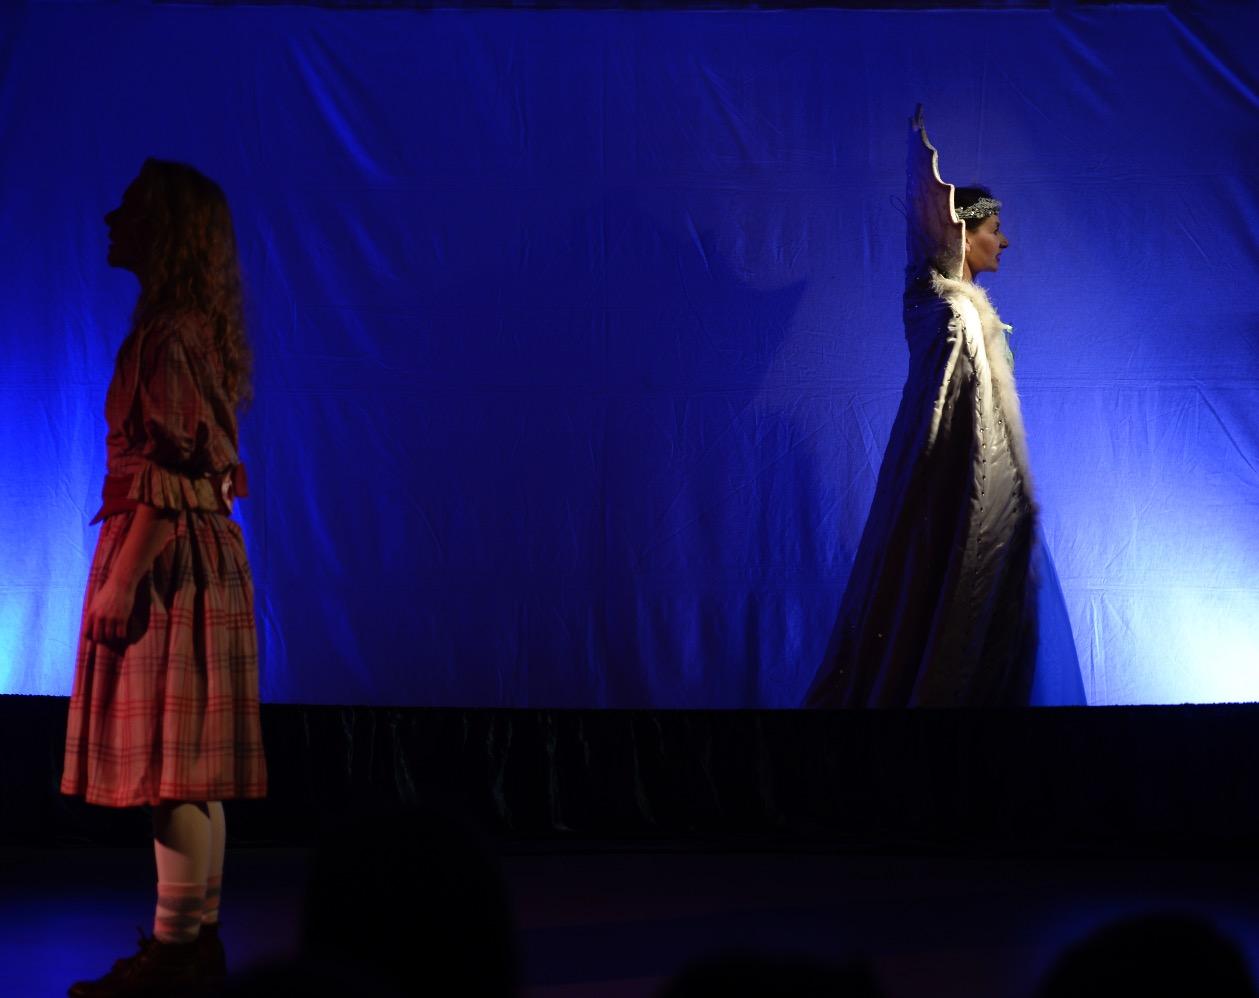 gerda et la reine des neiges